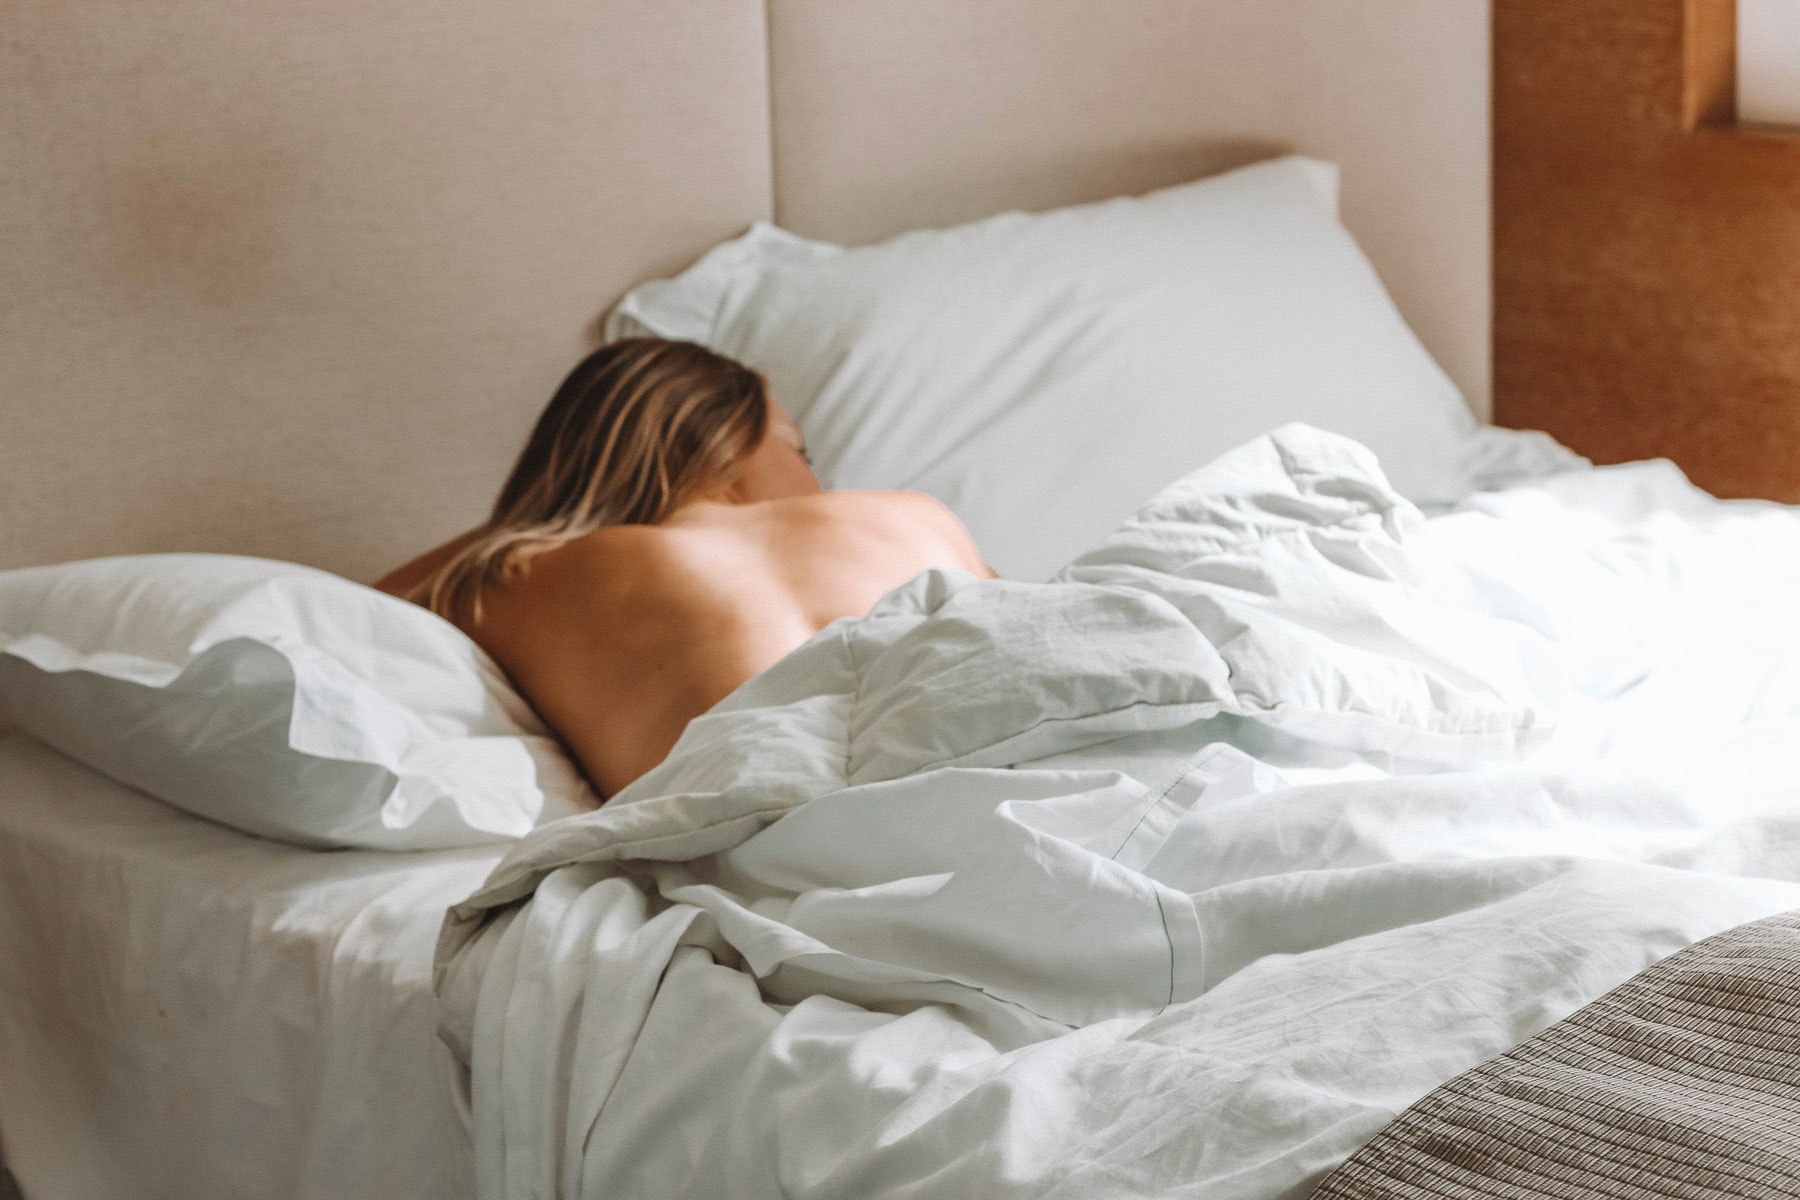 bien dormir conseils